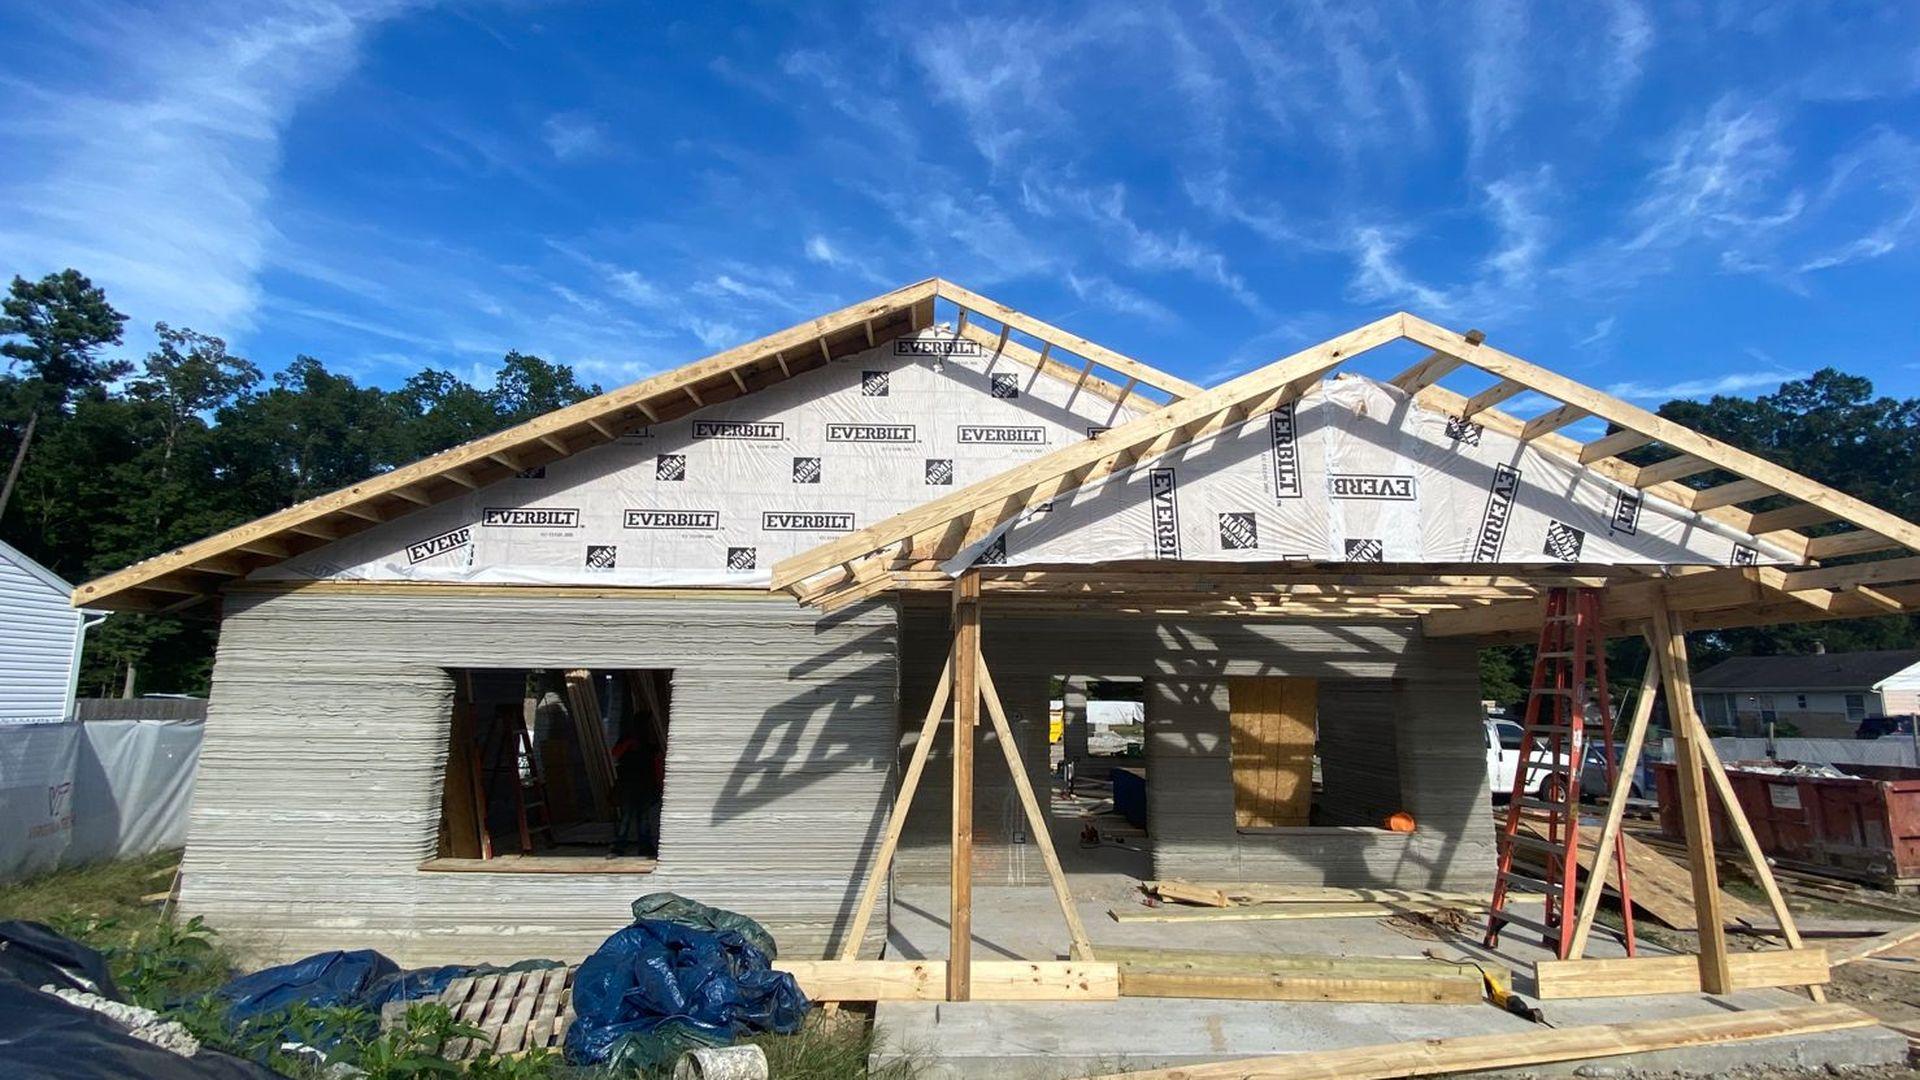 A 3D home under construction in Richmond, Virginia.